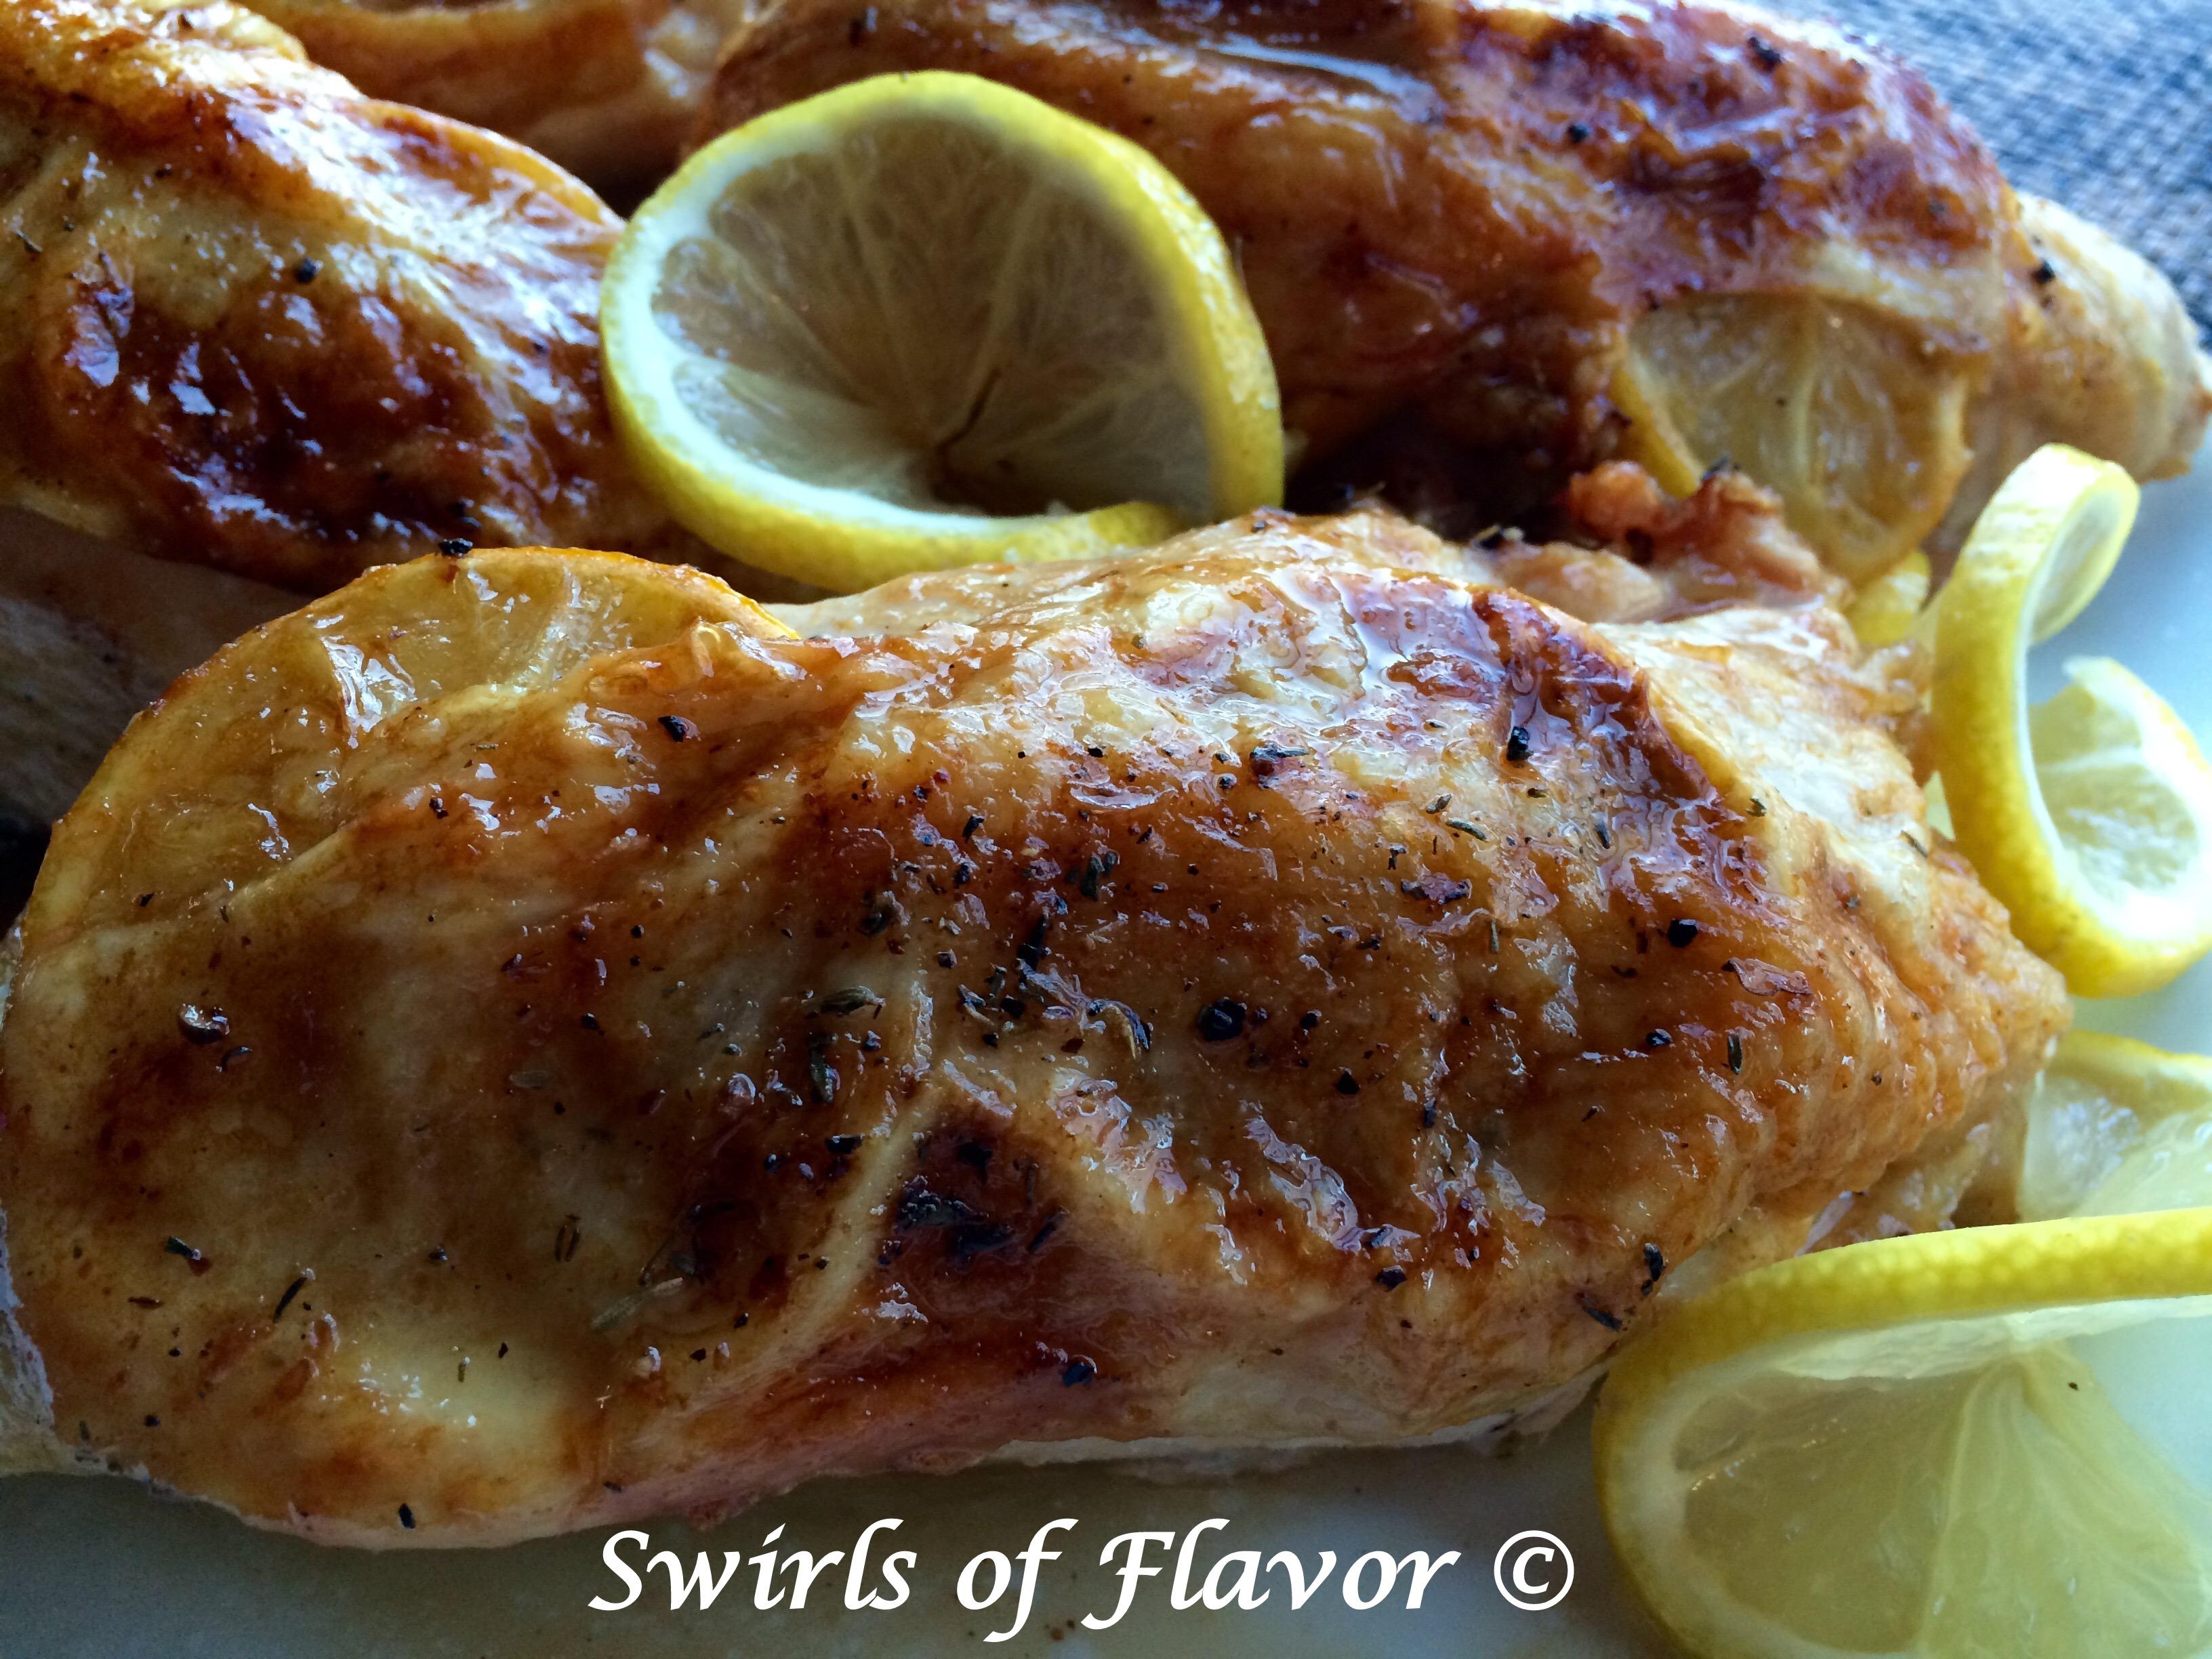 Oven Roasted Lemon Thyme Chicken with lemon slices